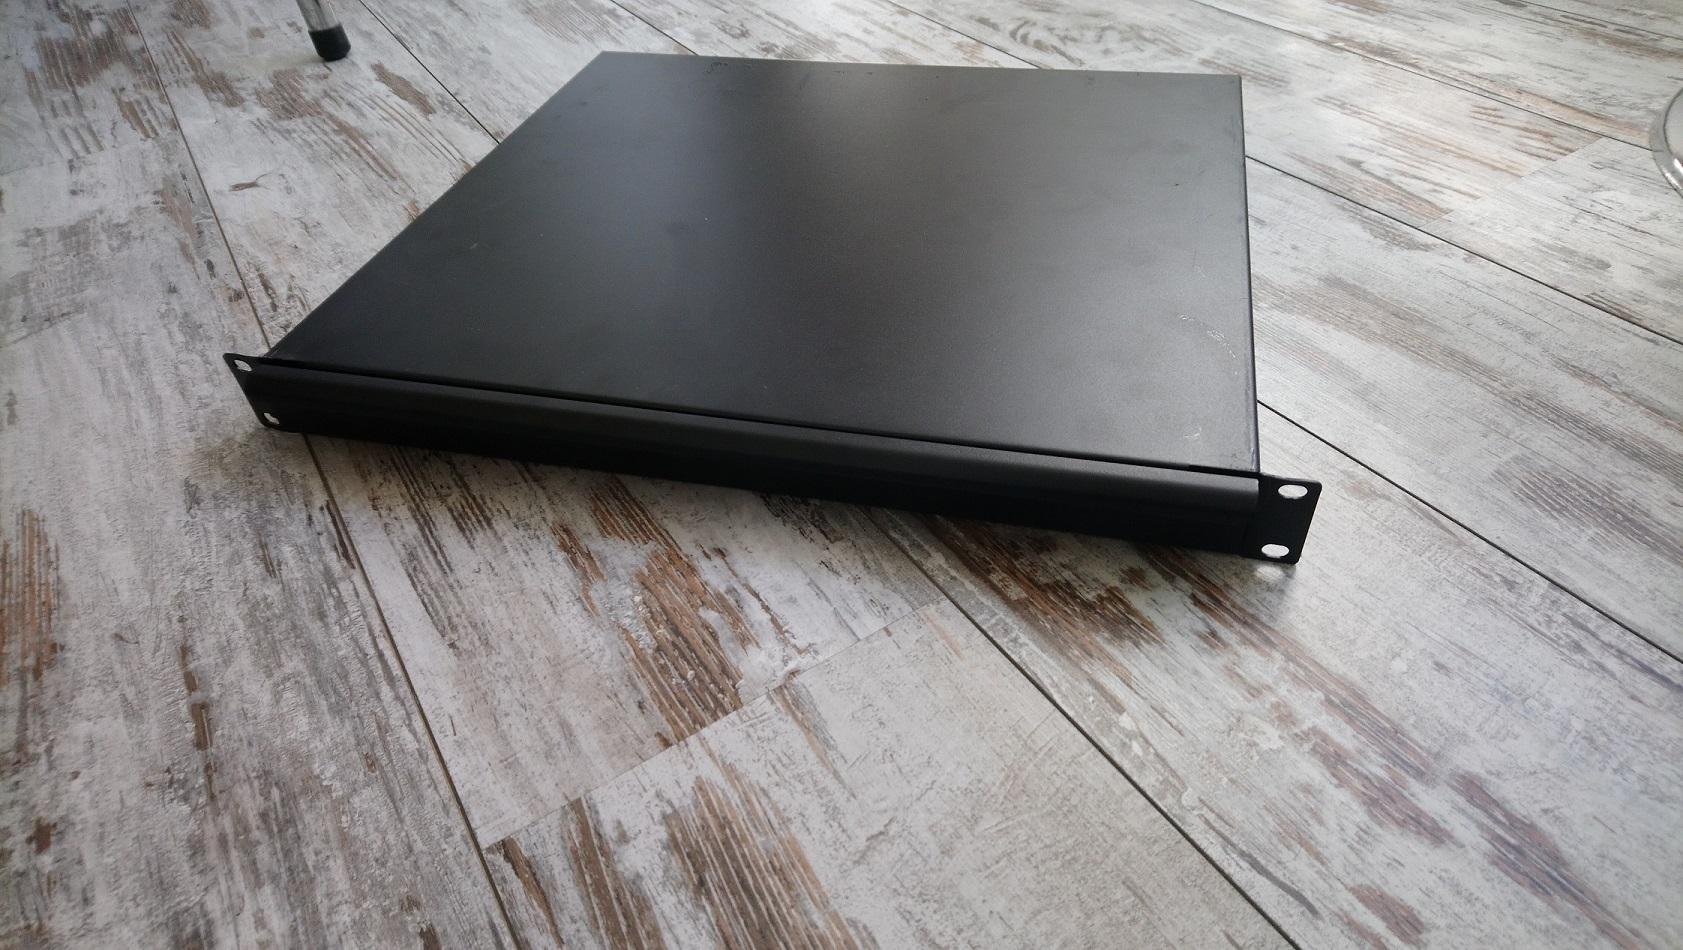 rack drawer 1u thon rack drawer 1u audiofanzine. Black Bedroom Furniture Sets. Home Design Ideas